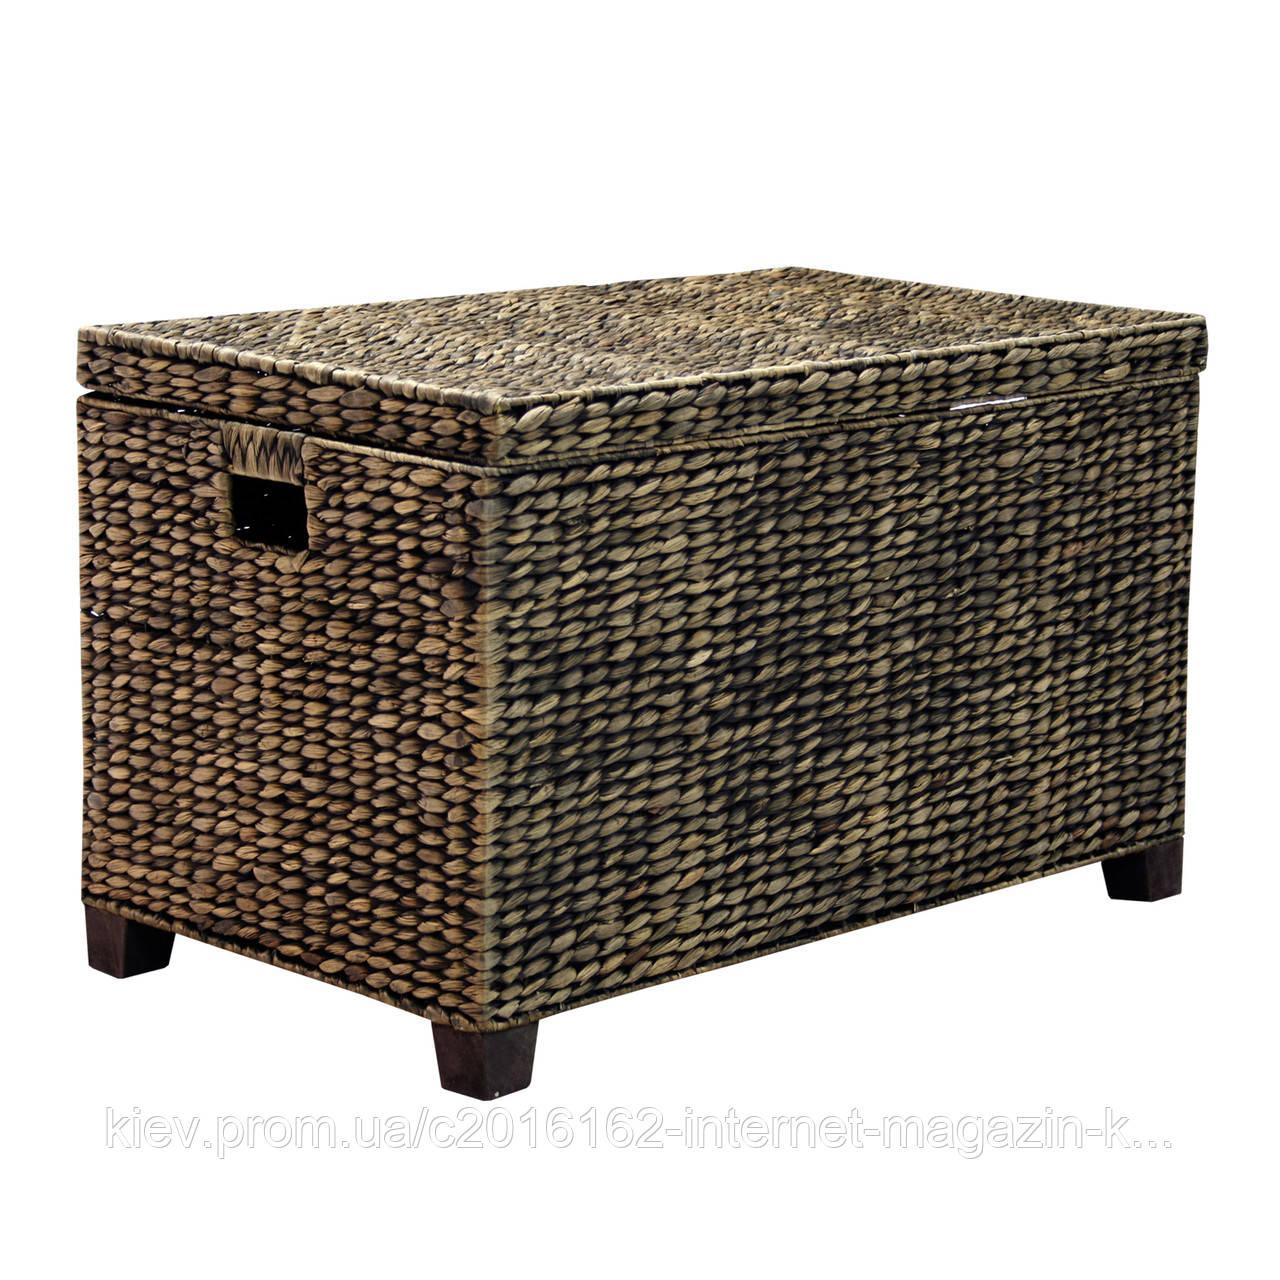 Корзина плетеная из ротанга Home4You MAYA-1  75x42xH46cm  dark brown